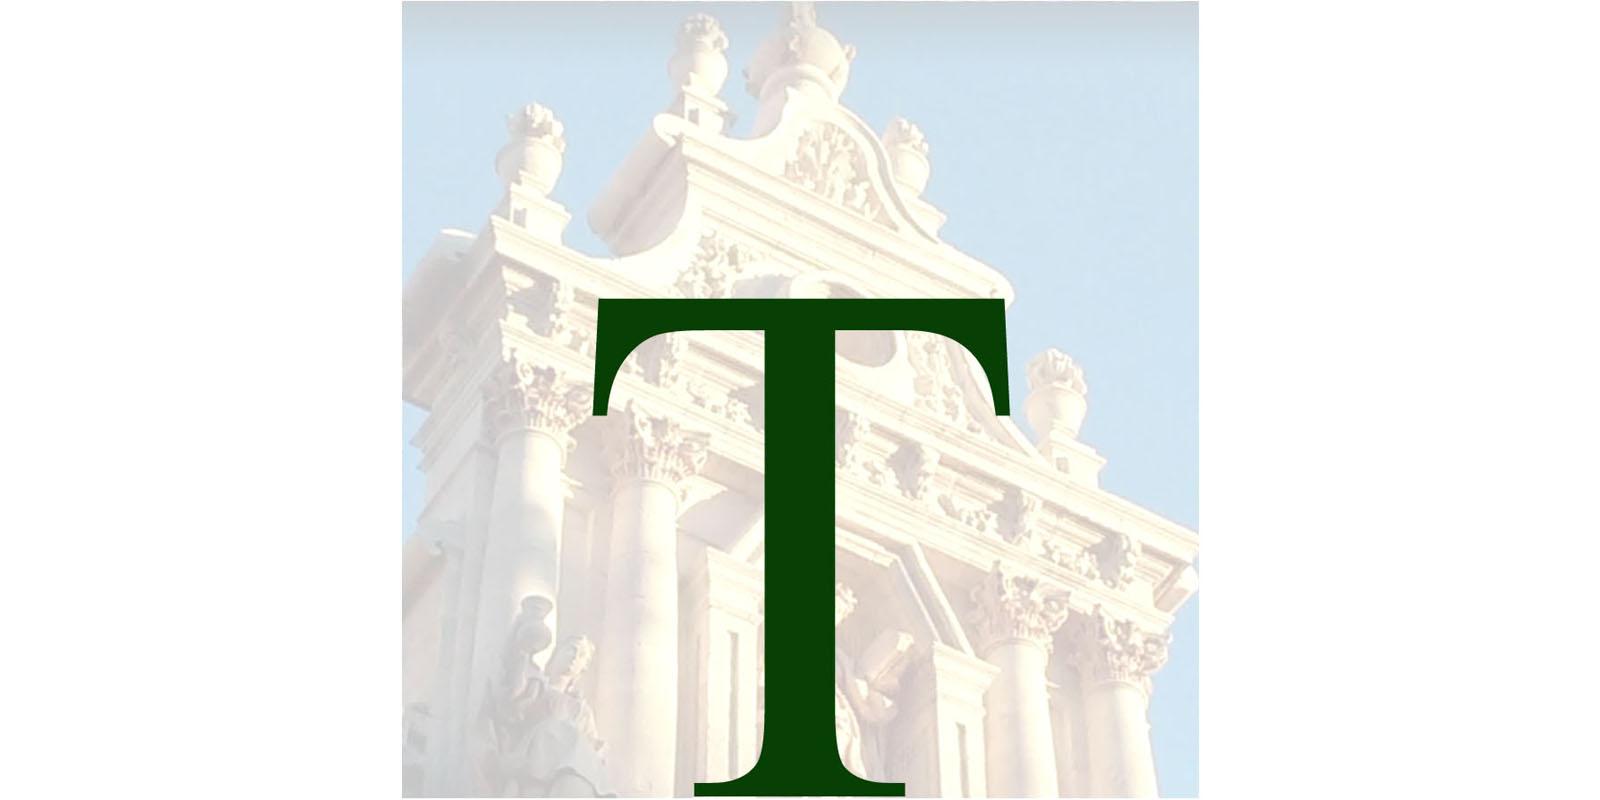 danielvillalobosalonso-indexpublications-architecturalpublications-8.2